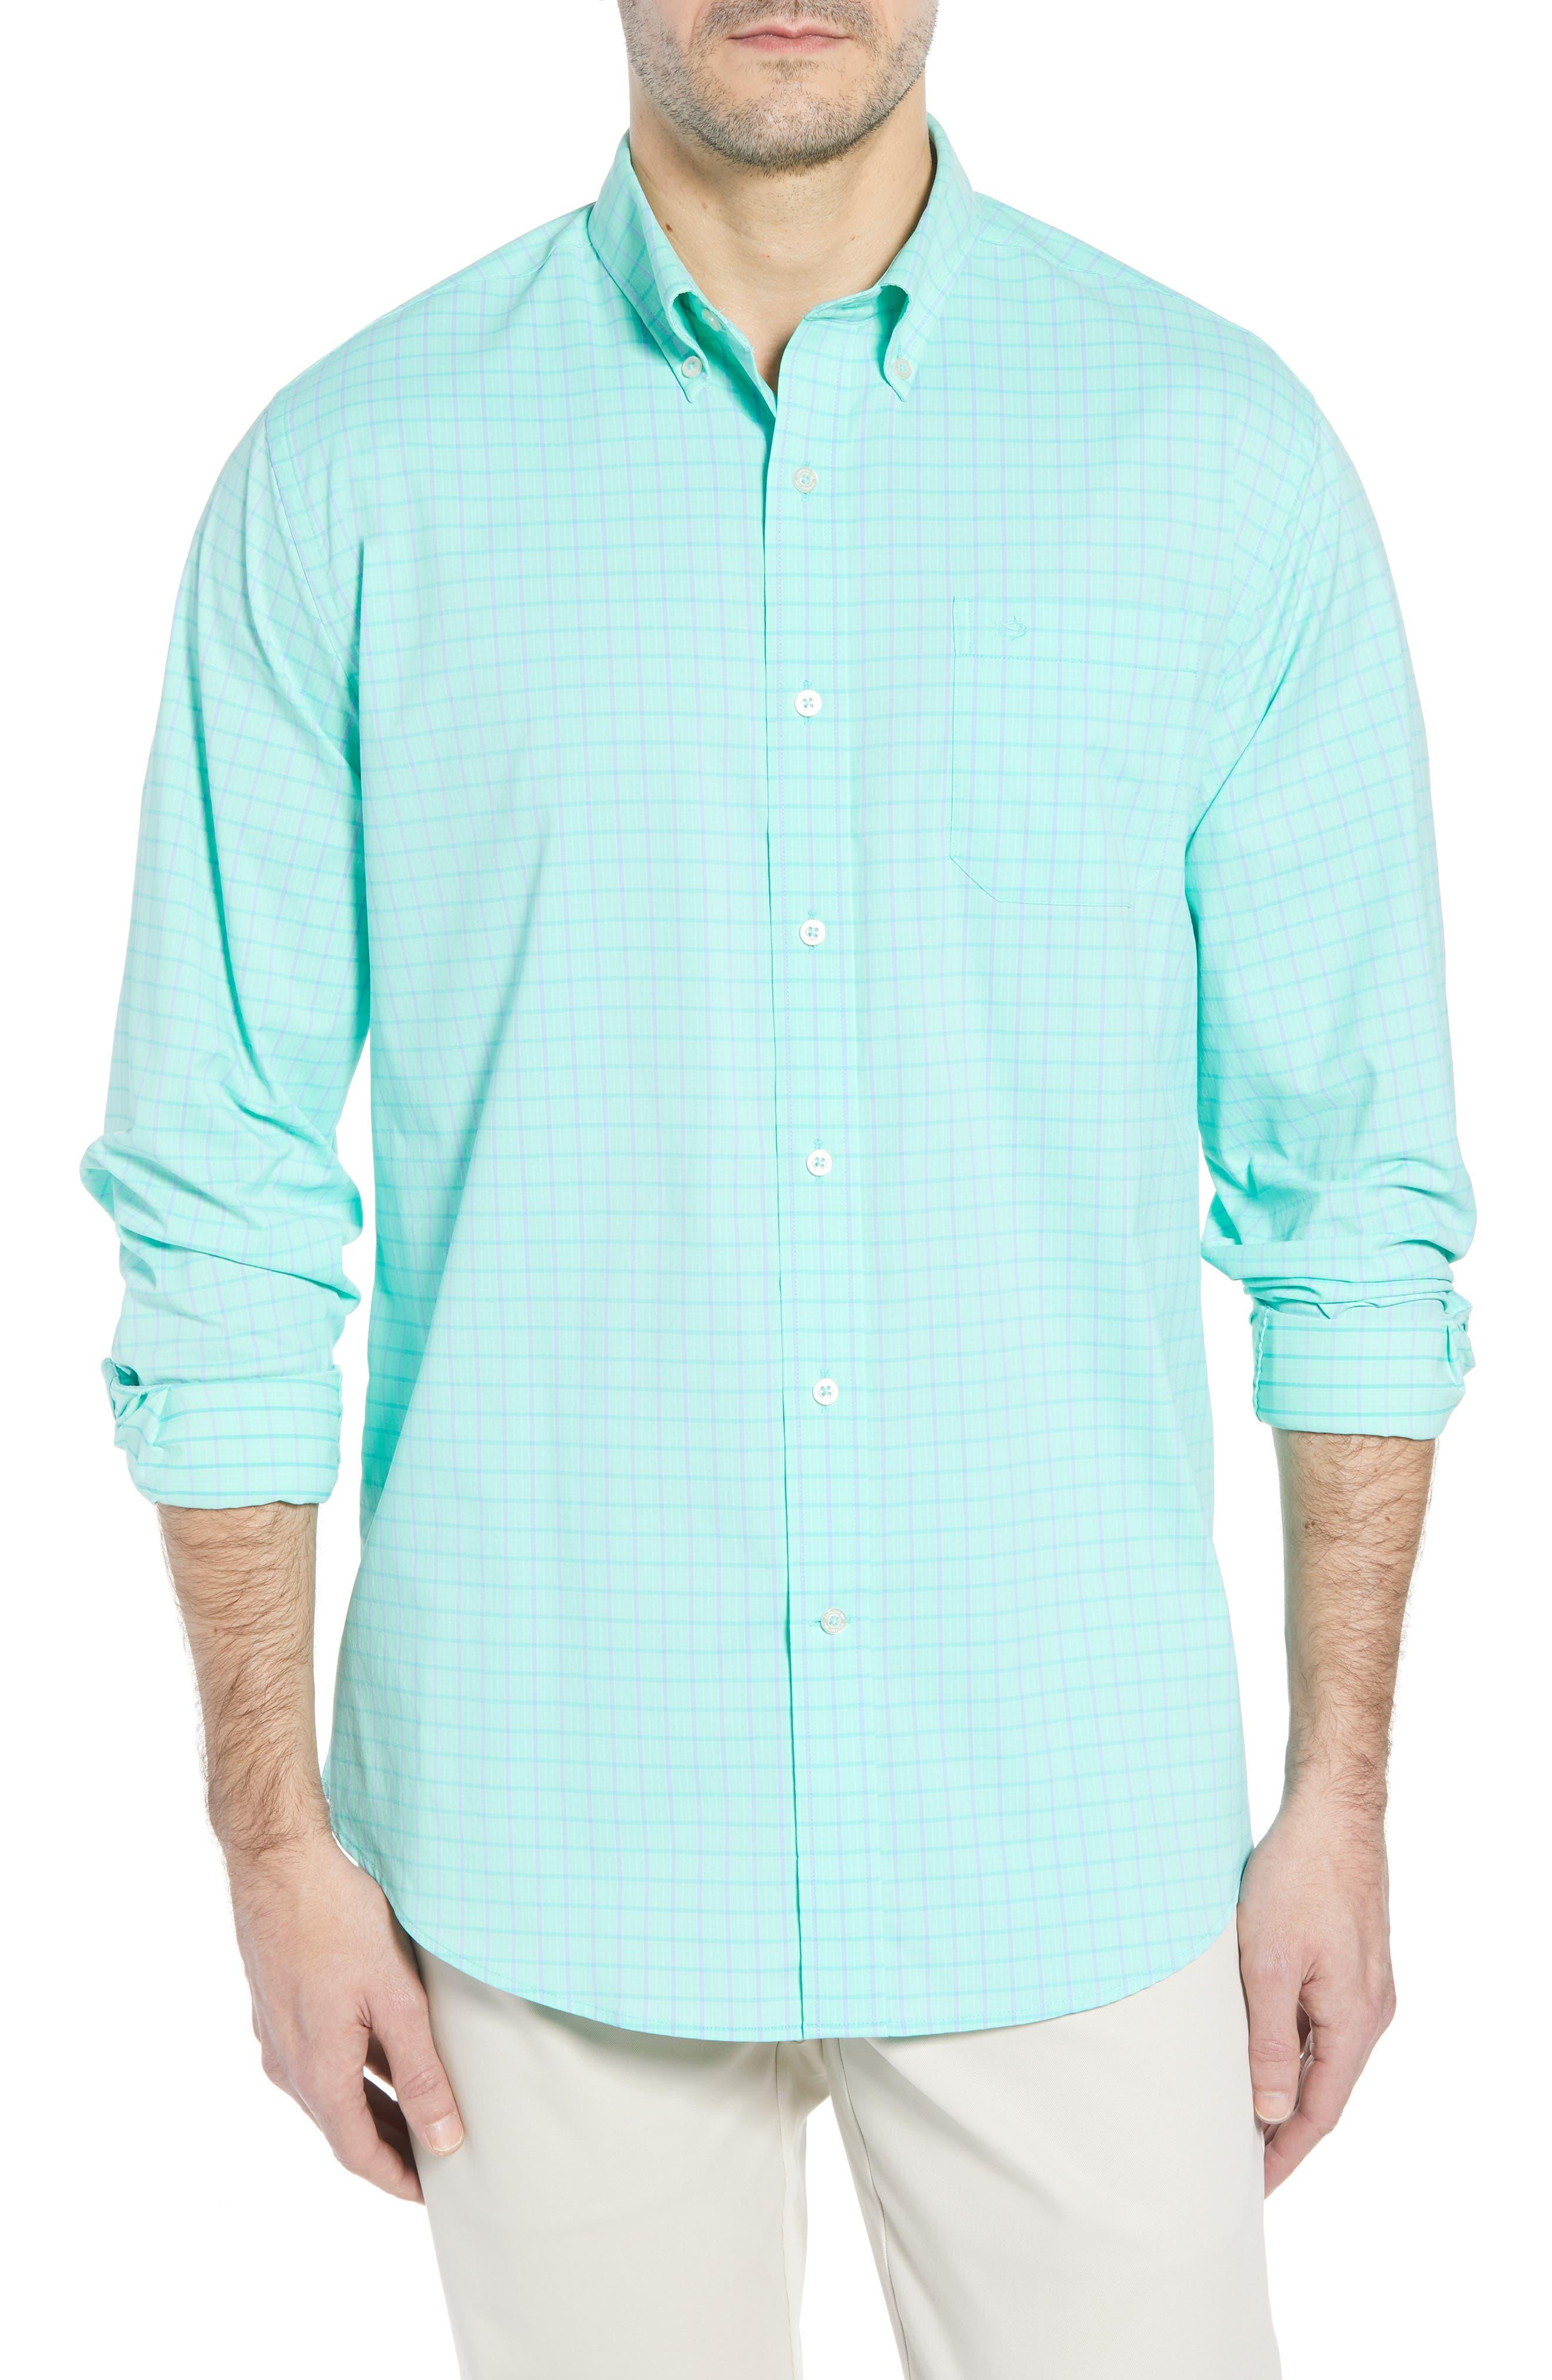 Intercoastal Gordia Plaid Sport Shirt,                             Main thumbnail 1, color,